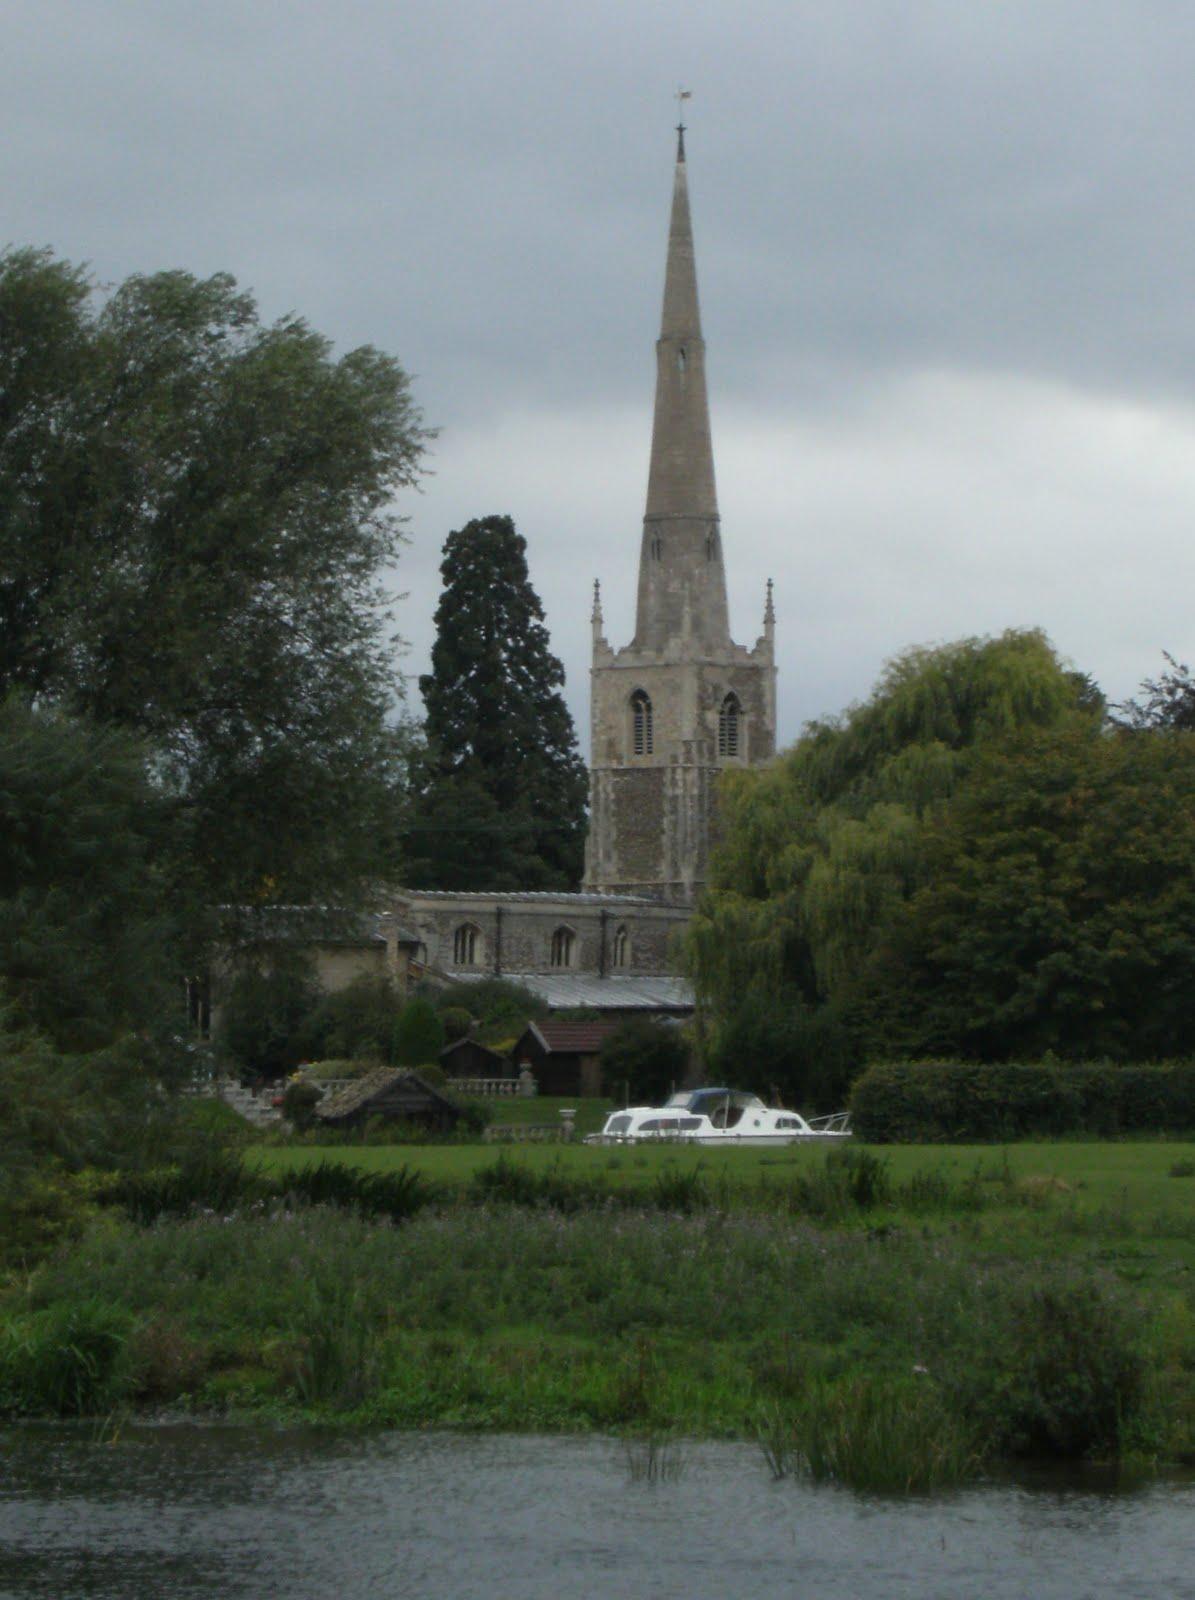 DSCF9452 Hemingford Abbotts church